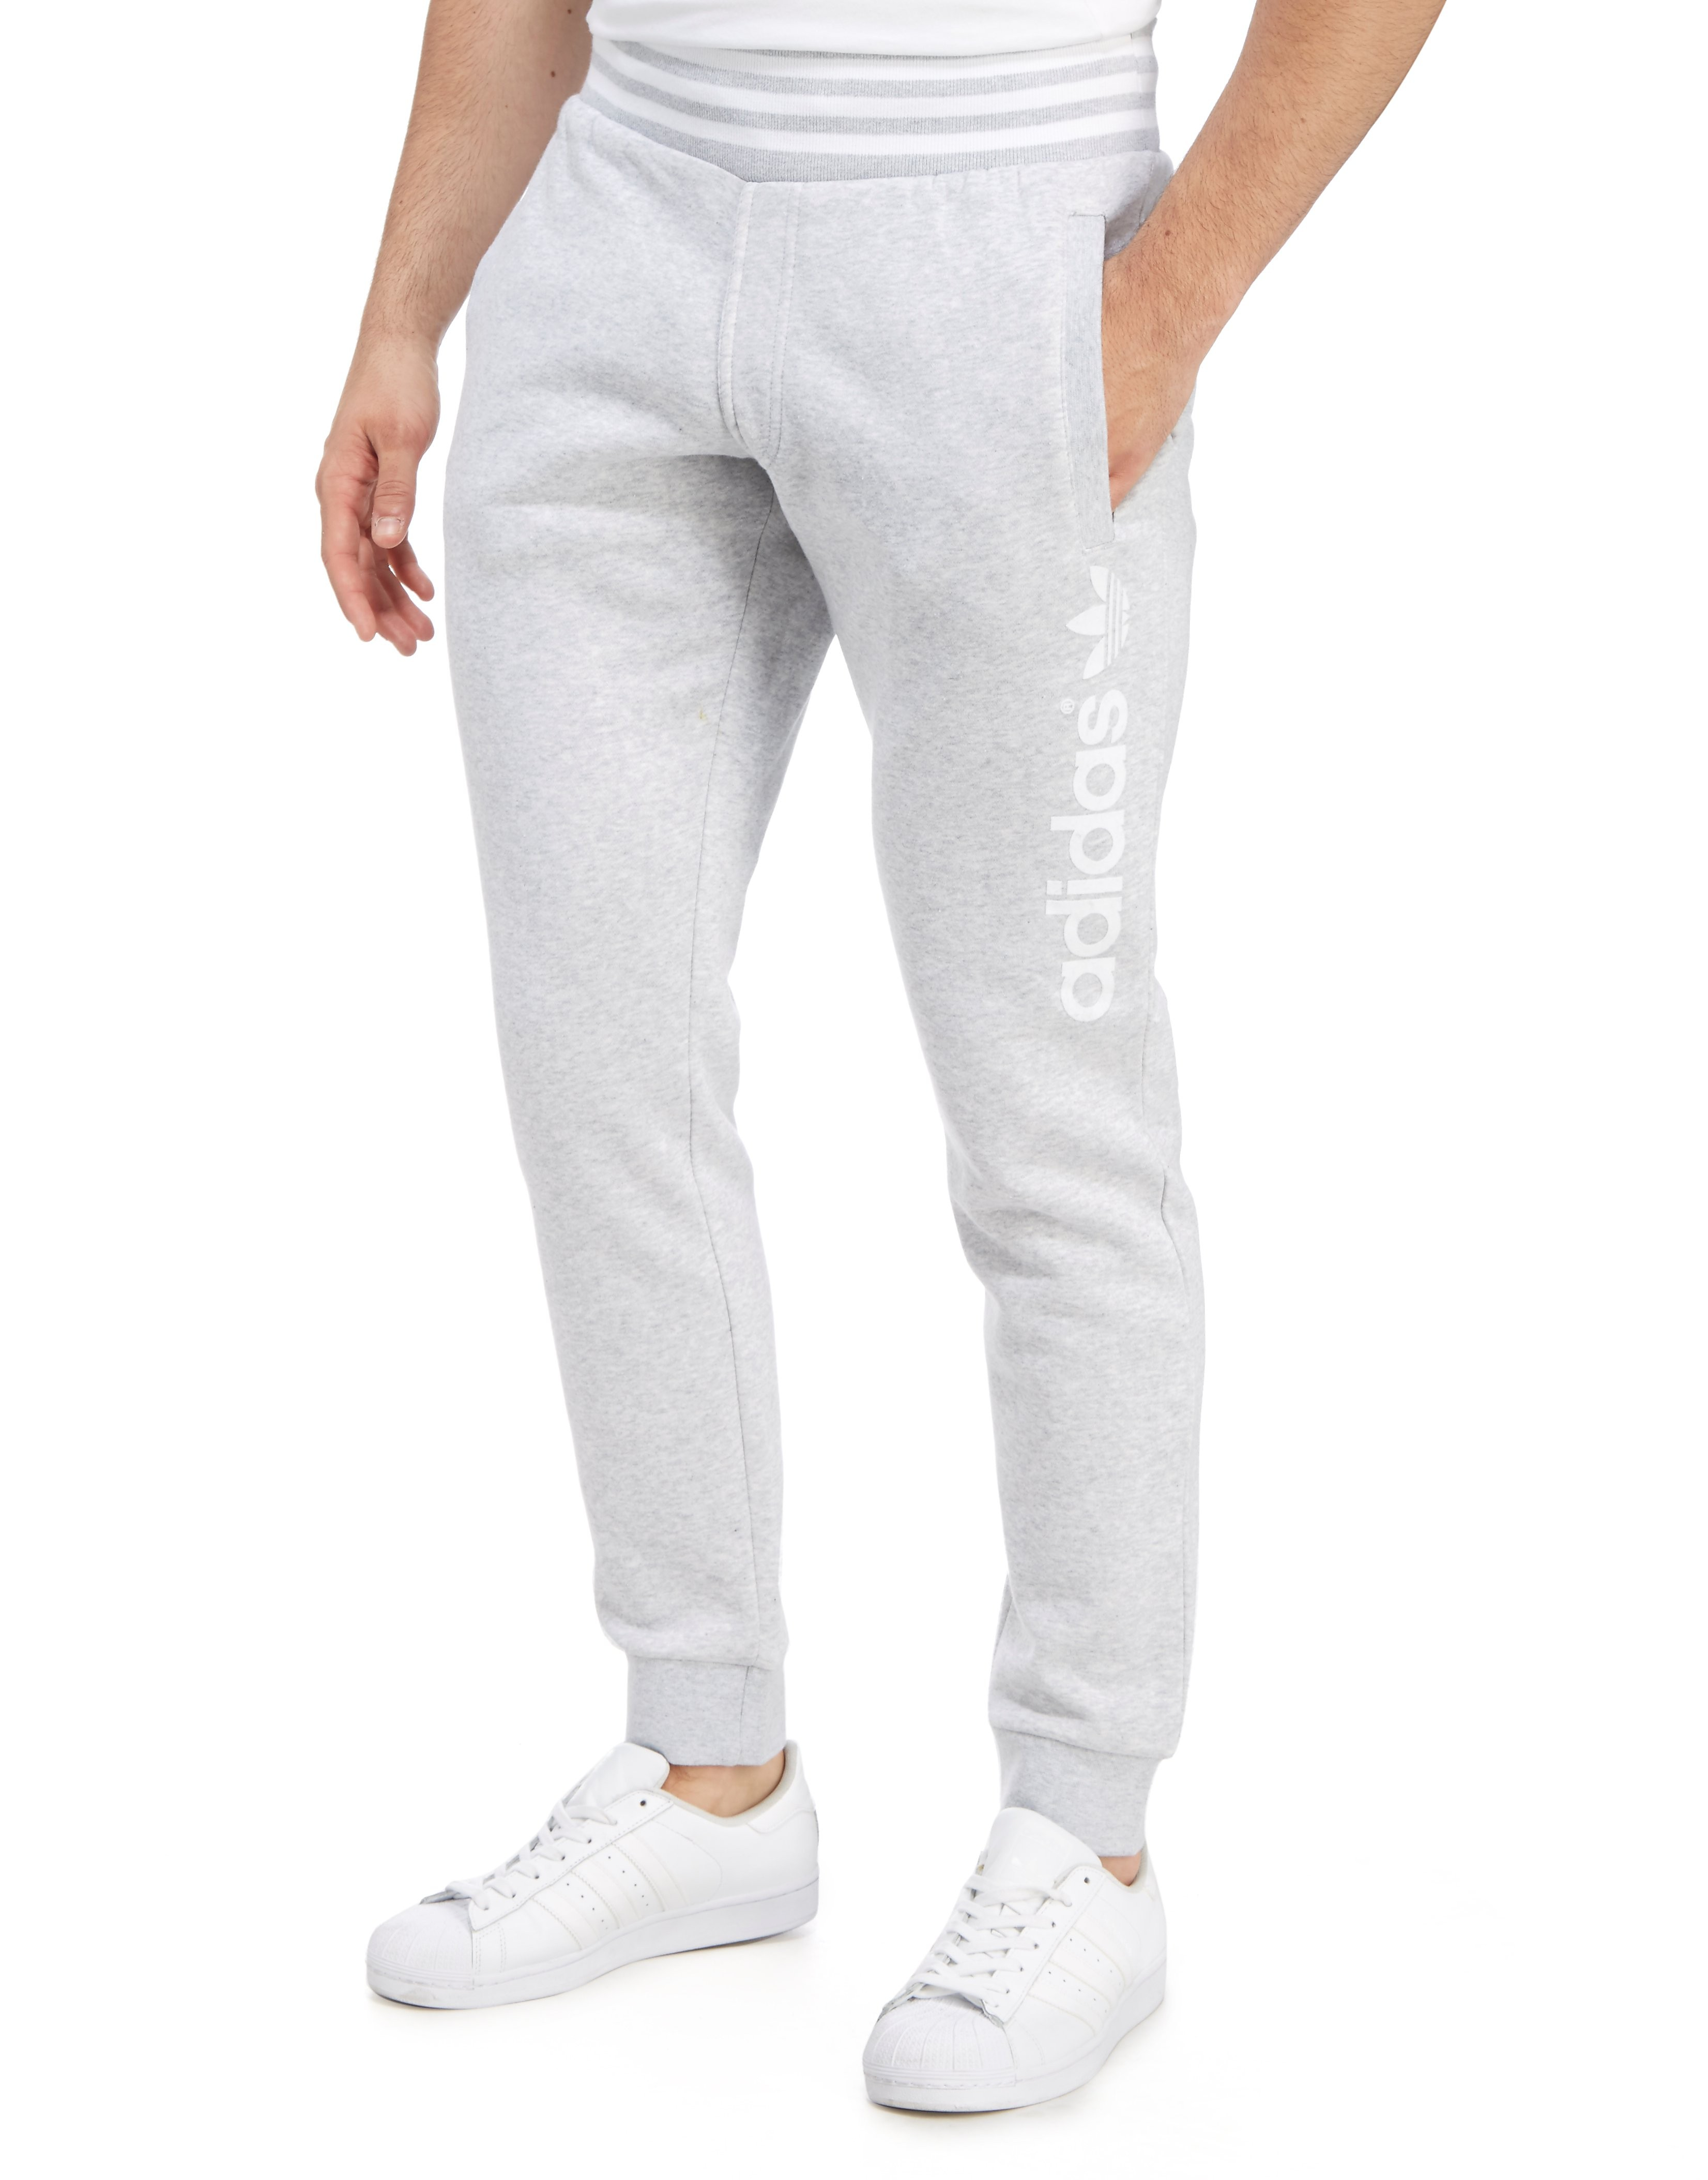 adidas Originals Trefoil 3-Stripes Linear Pants